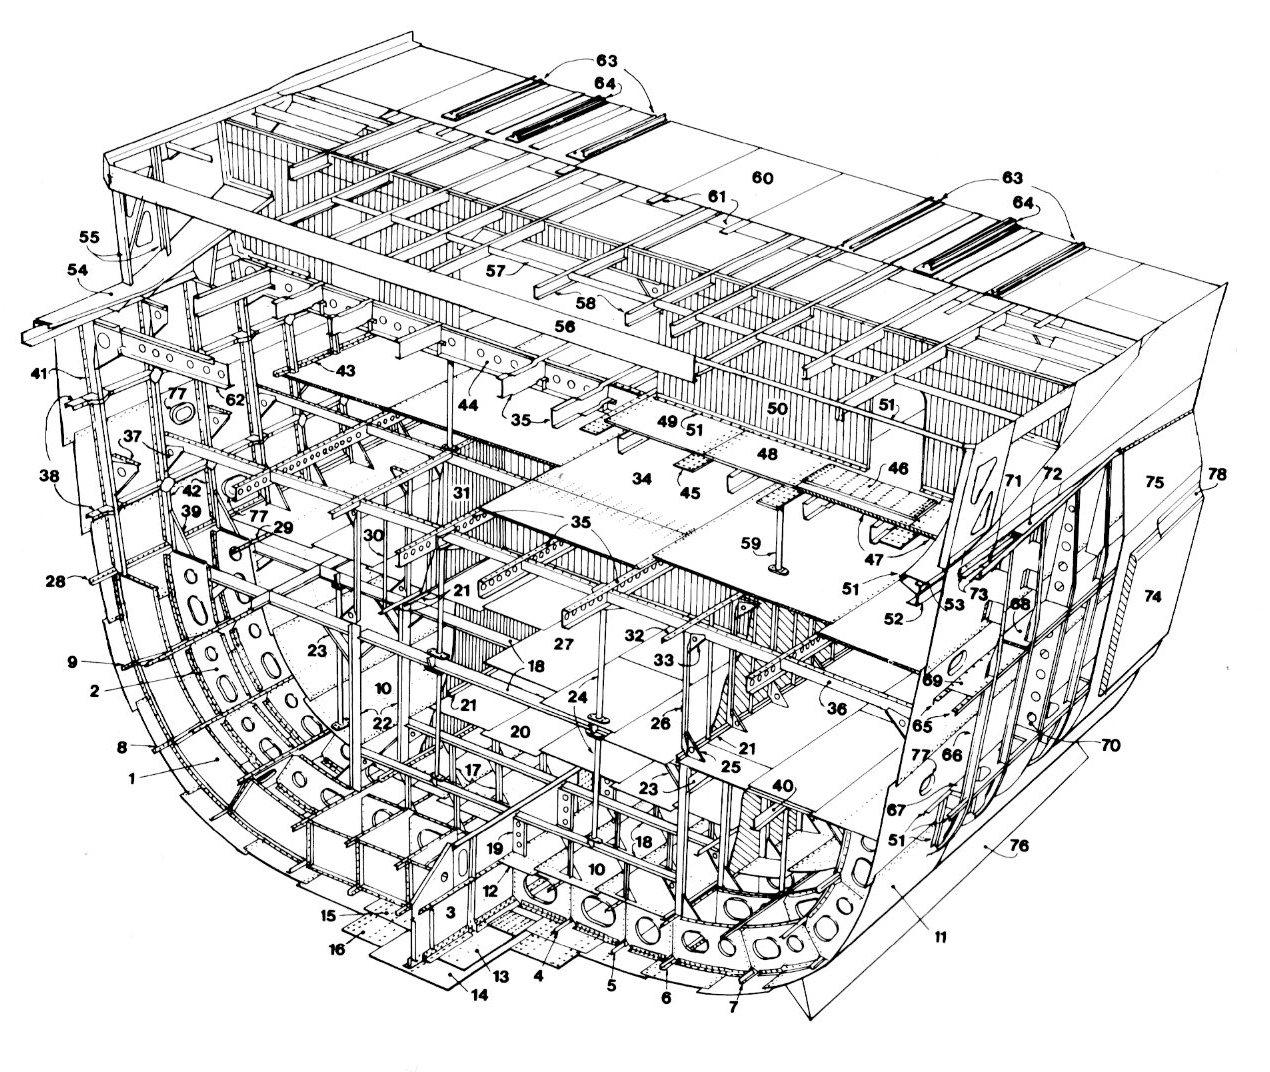 cessna 406 diagram 1970 chevy truck ignition wiring aircraft terminology flight mechanics